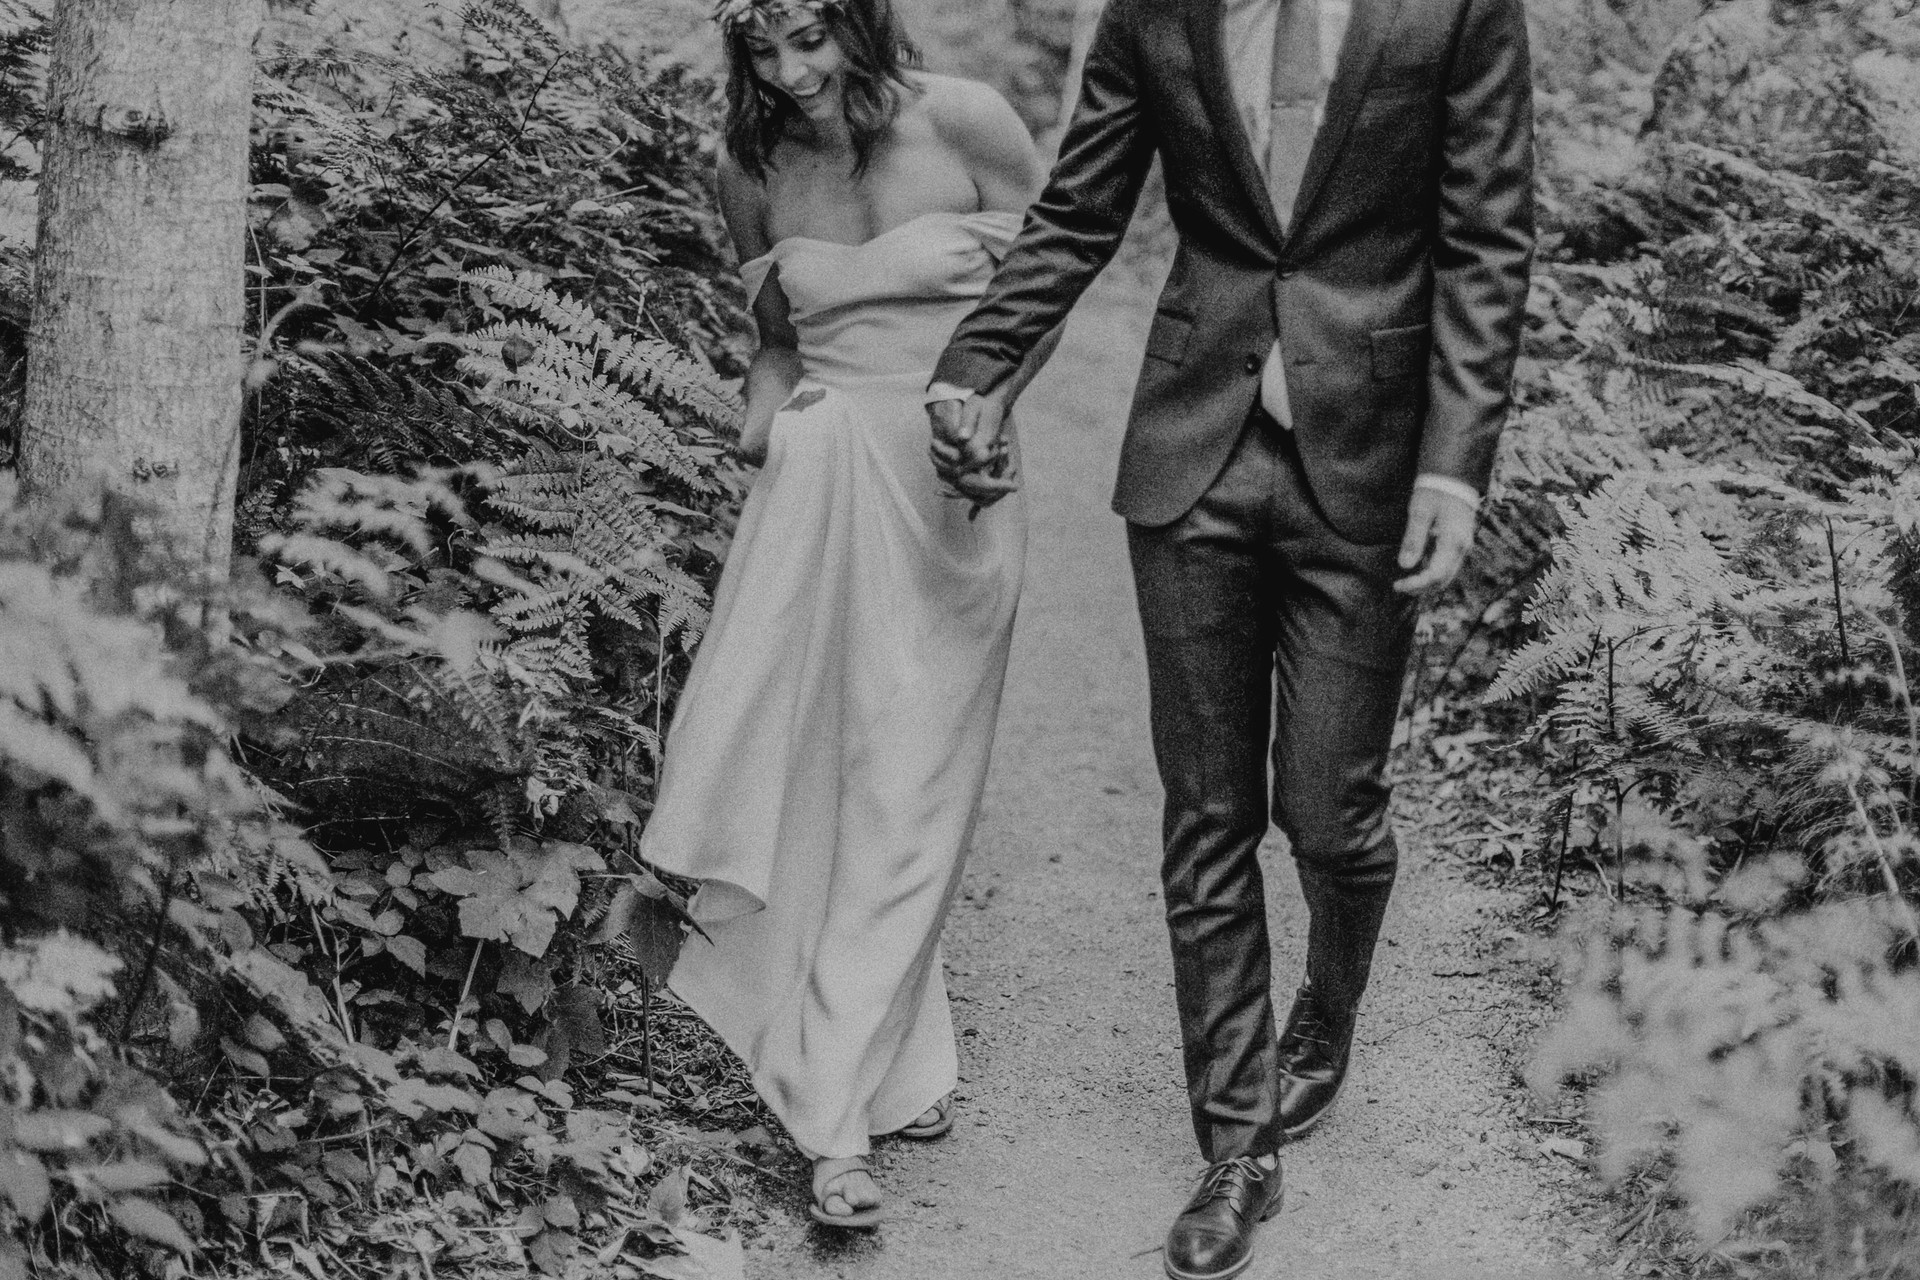 glen oaks big sur bride and groom walking through ferns